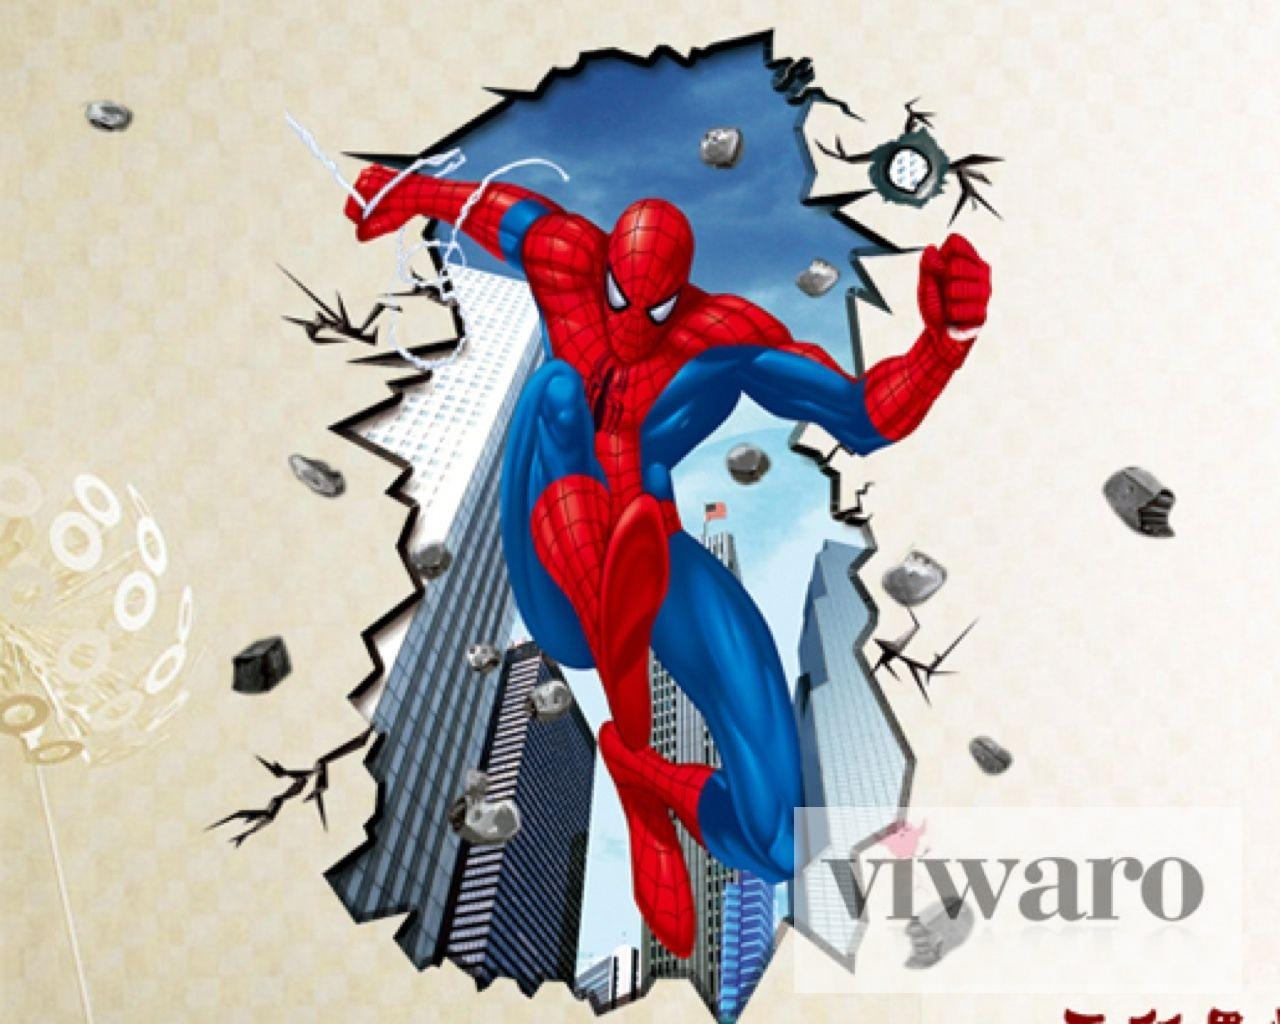 w190 wandtattoo spiderman superheld wandaufkleber sehr groß